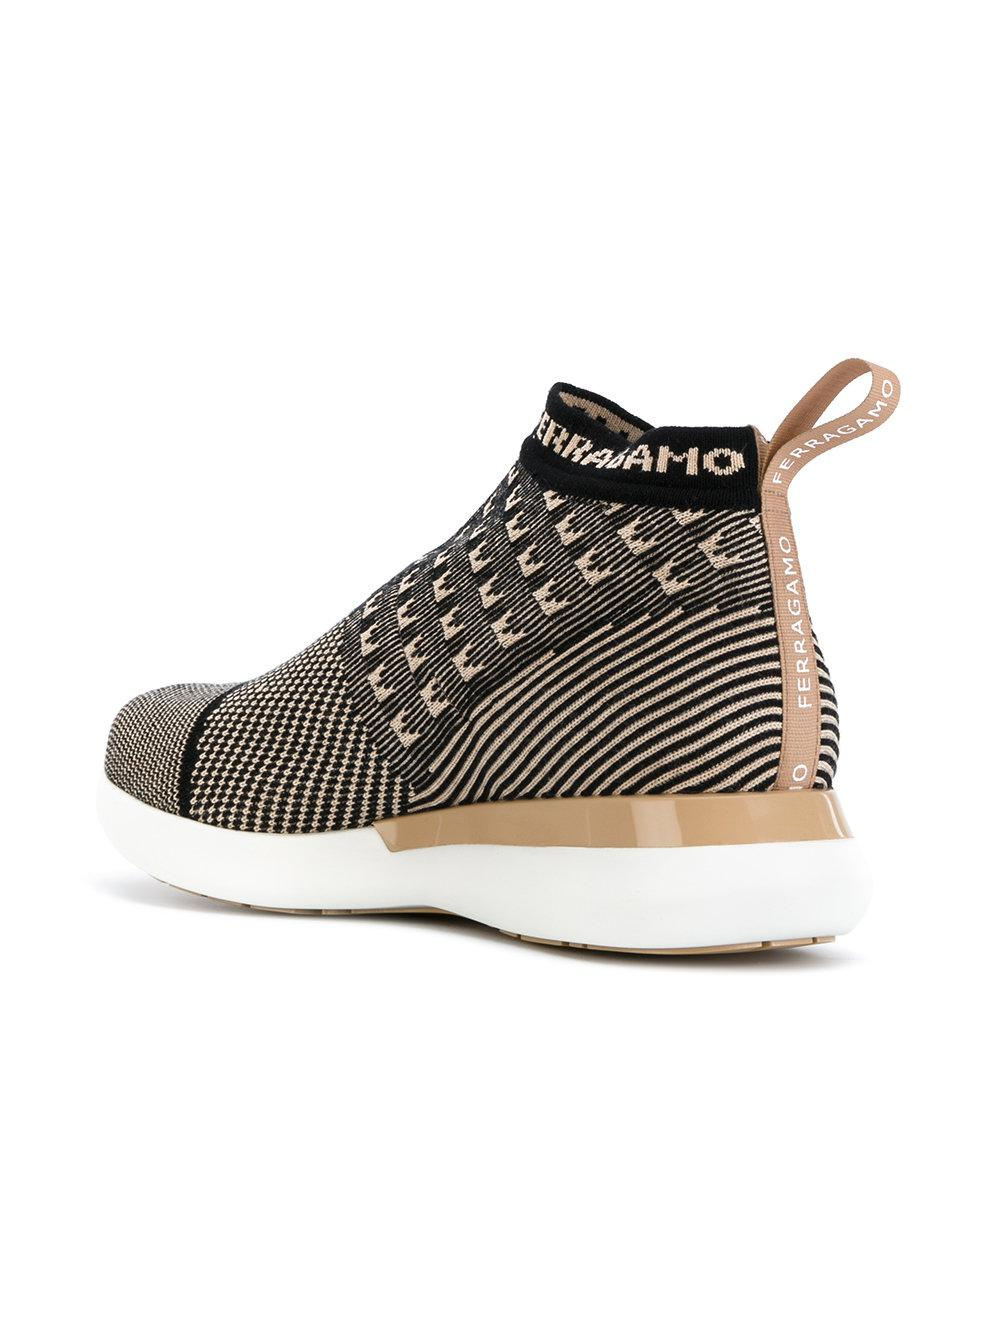 Chaussures De Sport De Chaussette Caprera Ferragamo ojEeS3